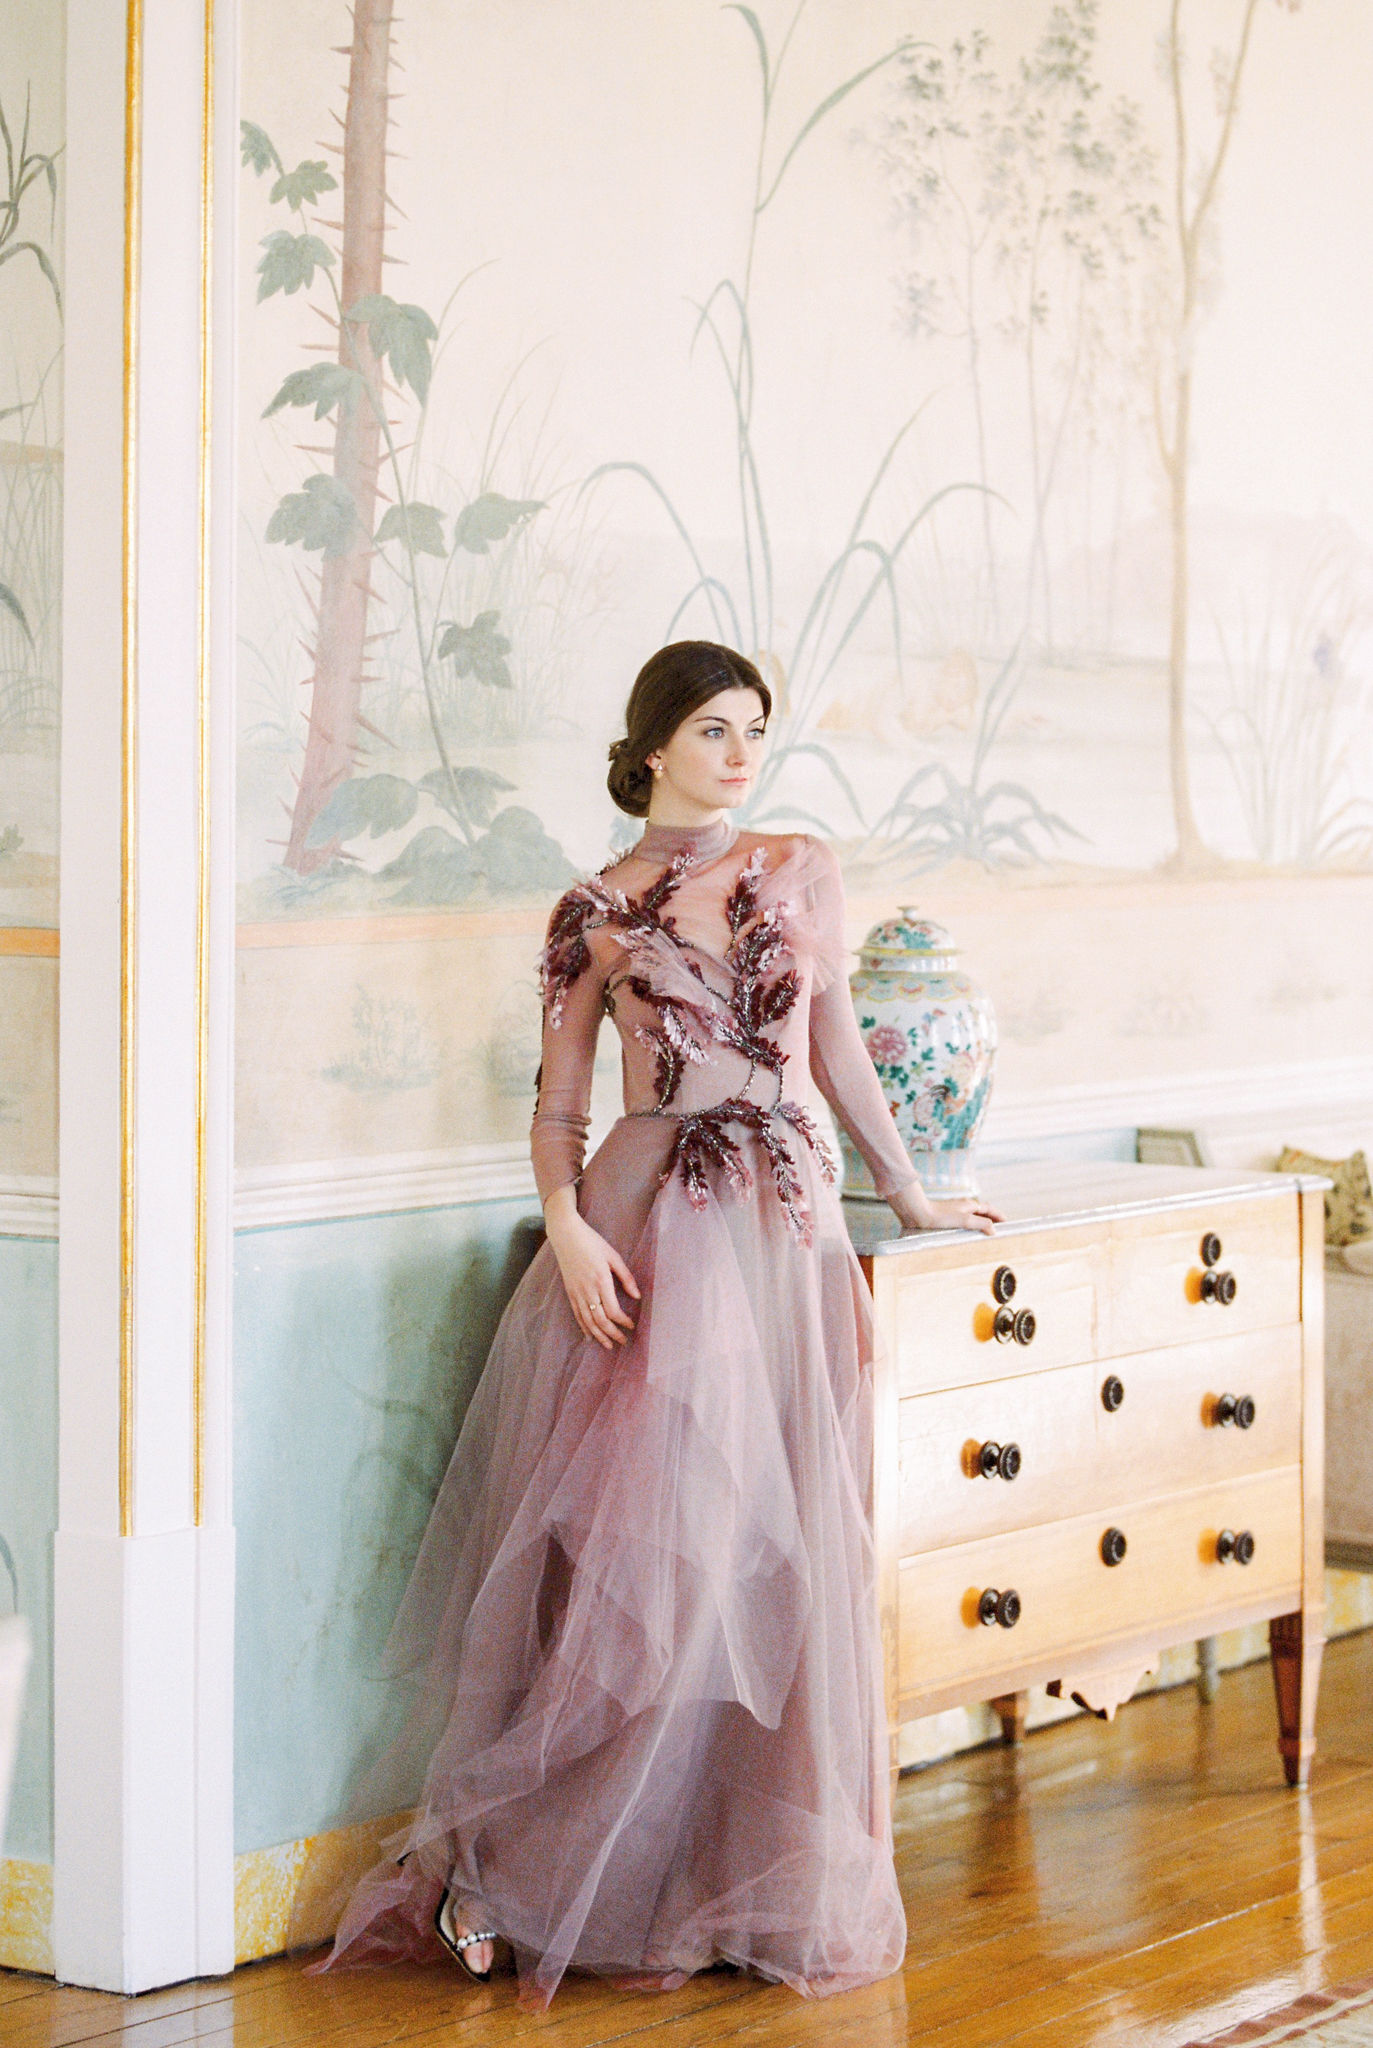 portugal-wedding-photography-elegance-007.jpg